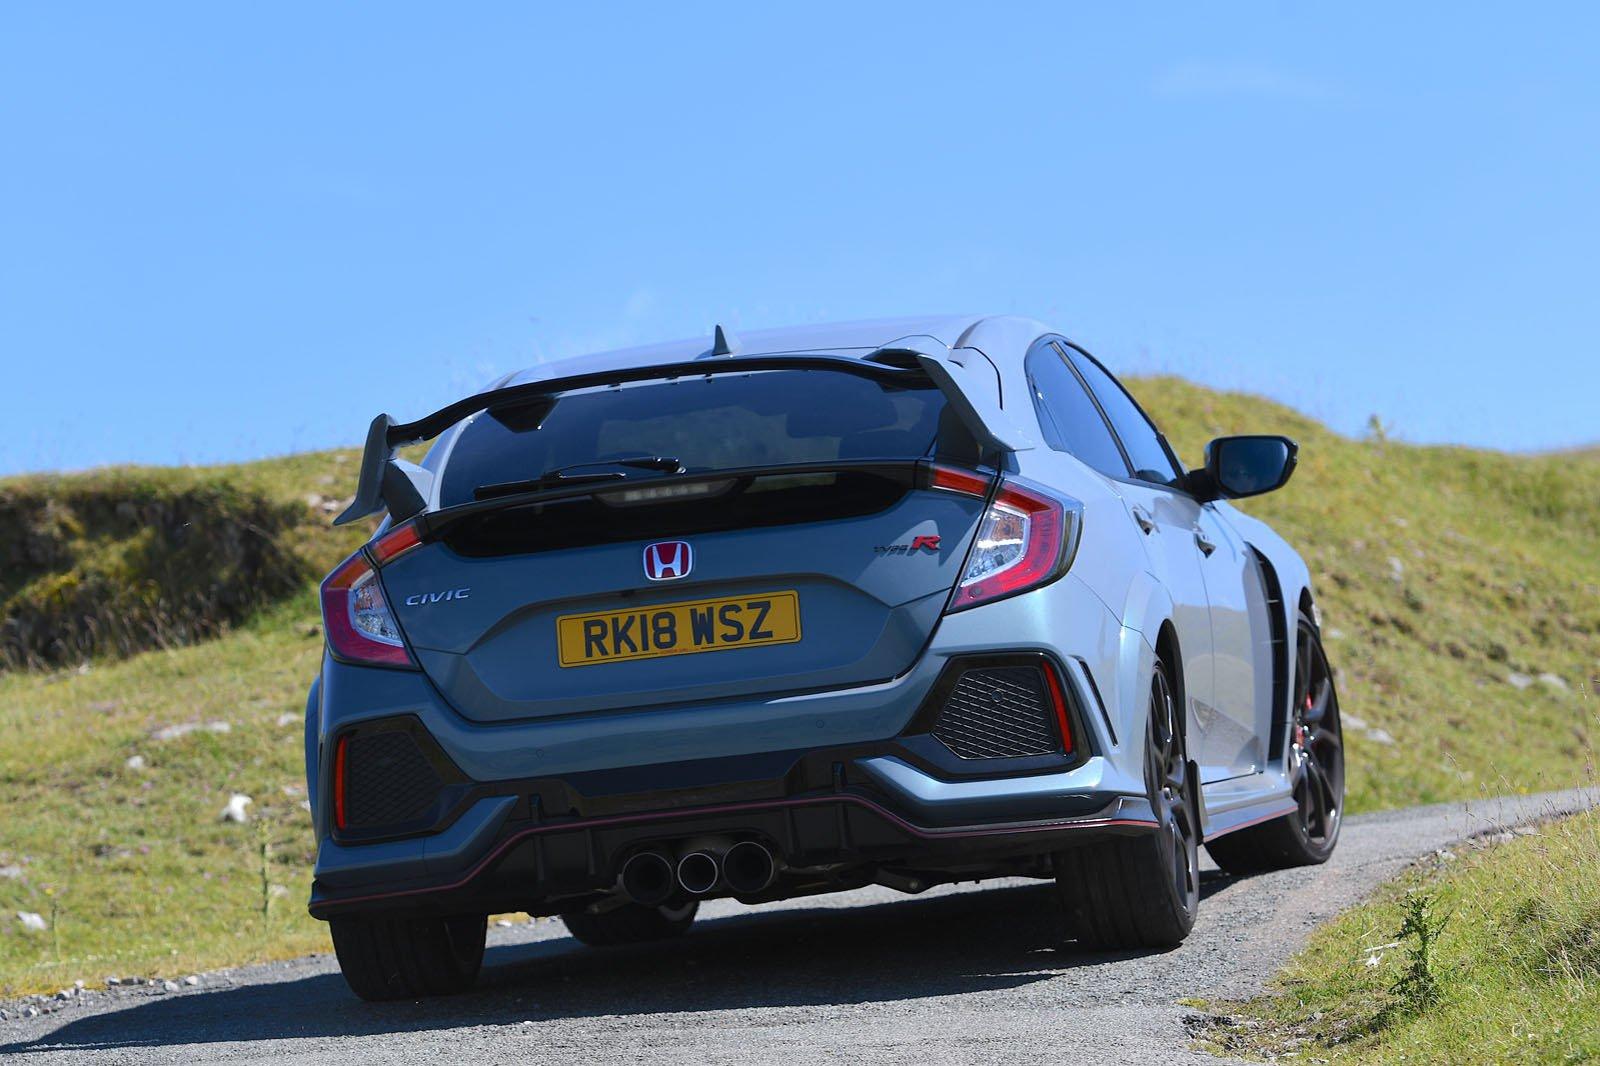 Honda Civic Type R 2018 rear right tracking shot